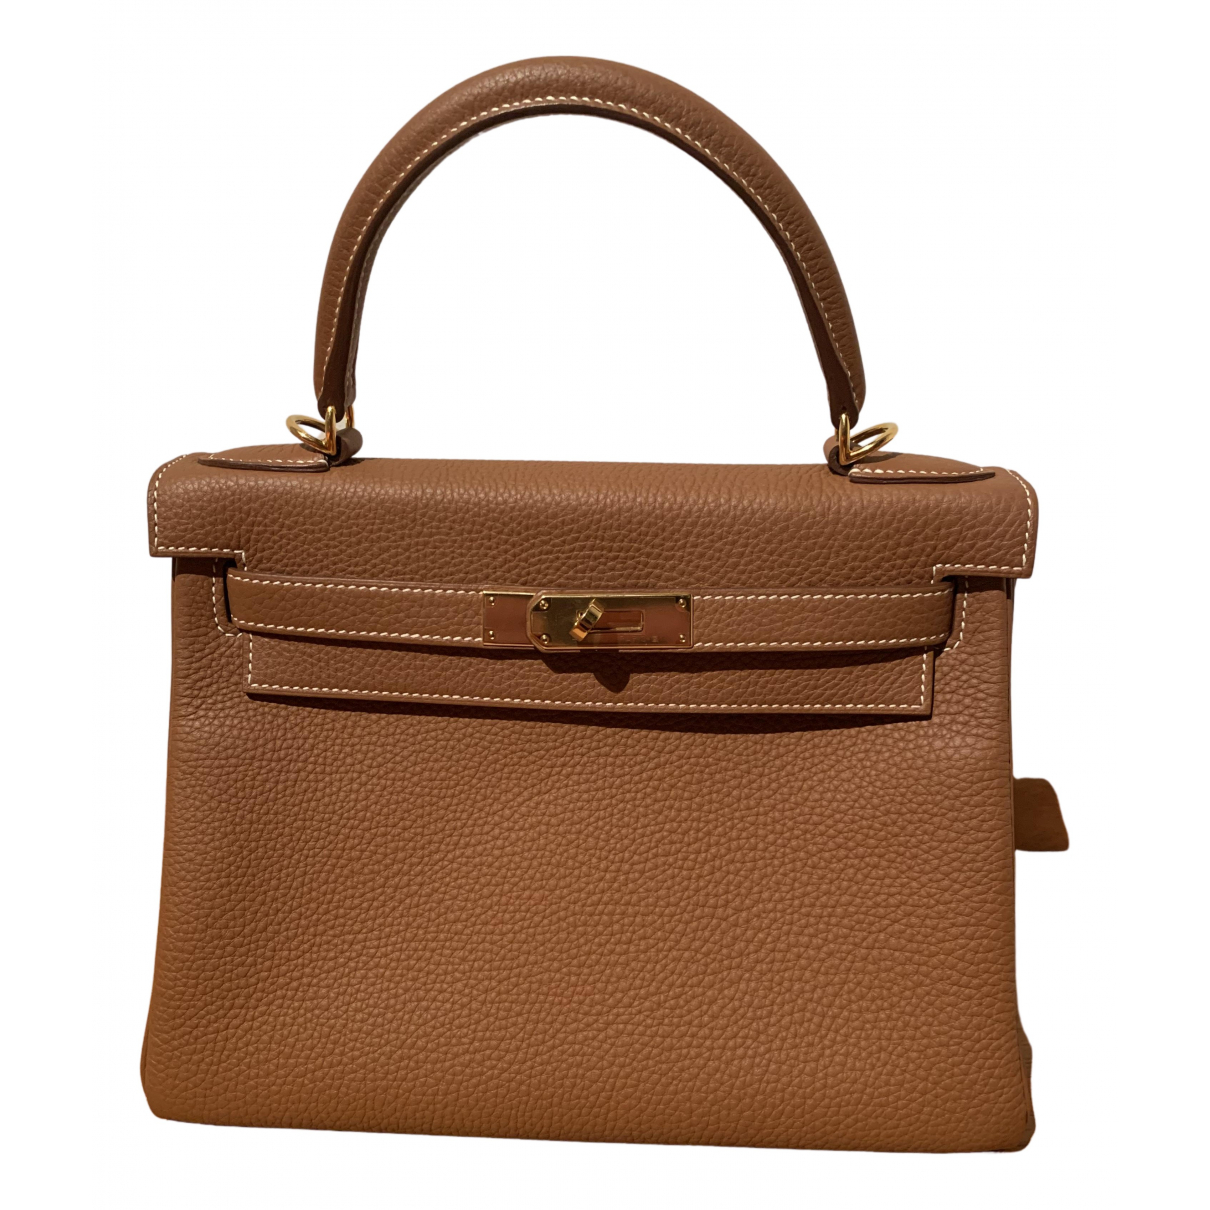 Hermes Kelly 28 Handtasche in  Braun Leder